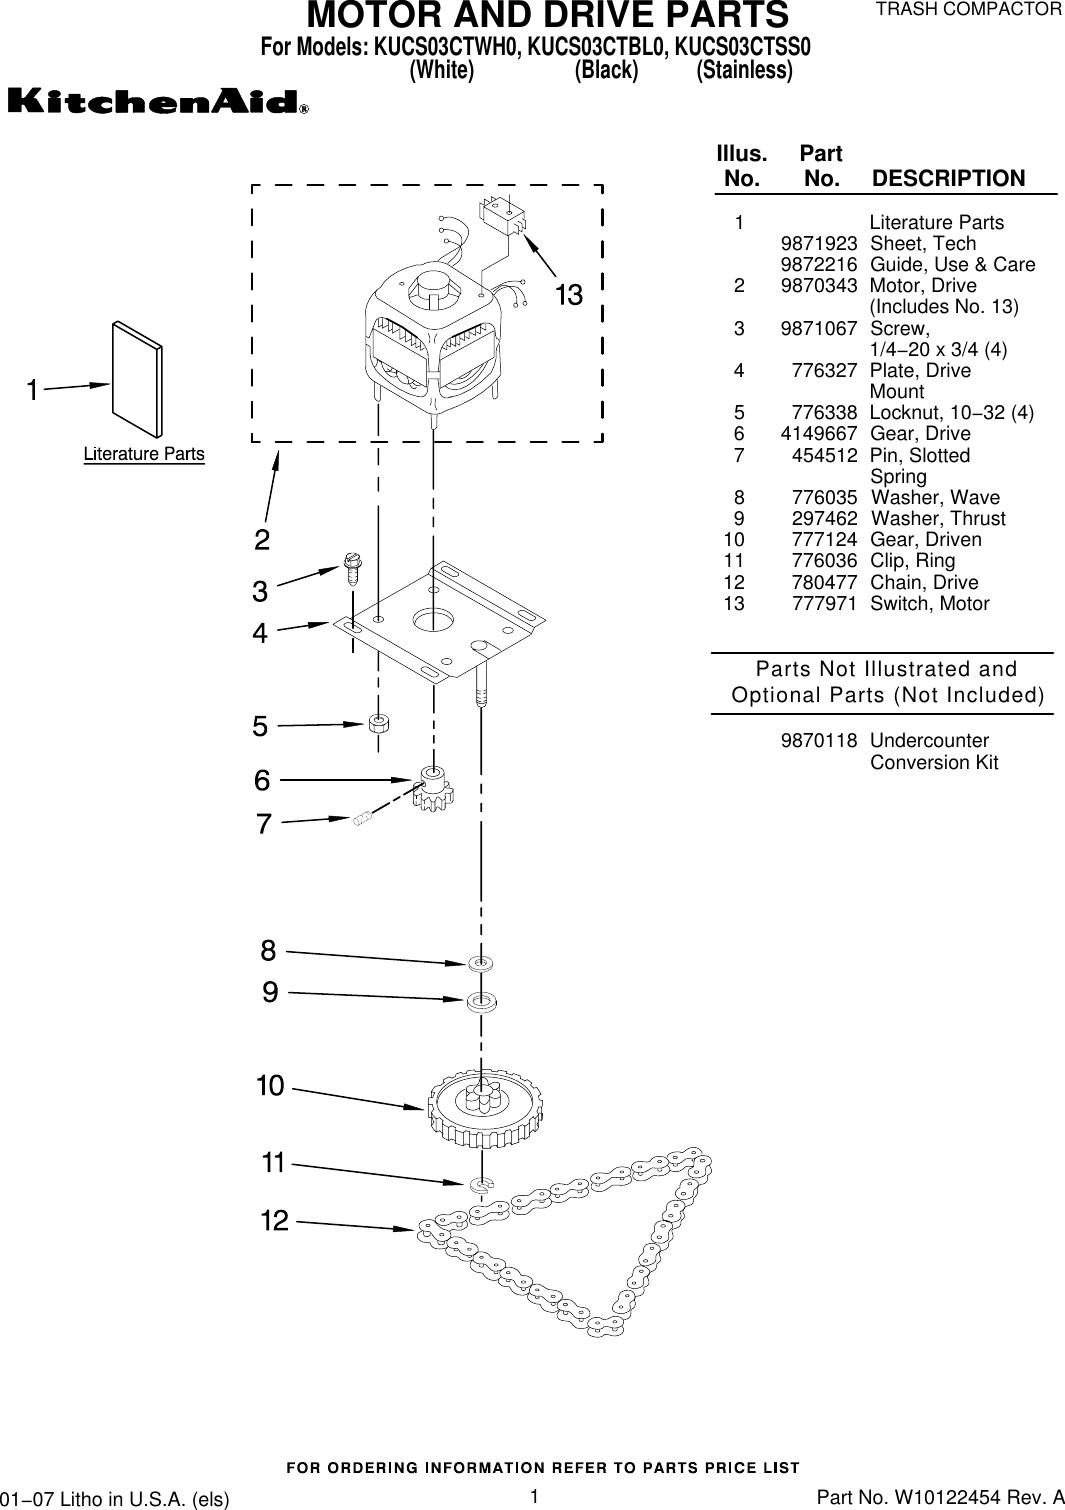 Kitchenaid Washer Motor Diagram Bosch Lg Amana Wire Kucs03ctbl0 Users Manual On Wiring Schematic Dishwasher Pump